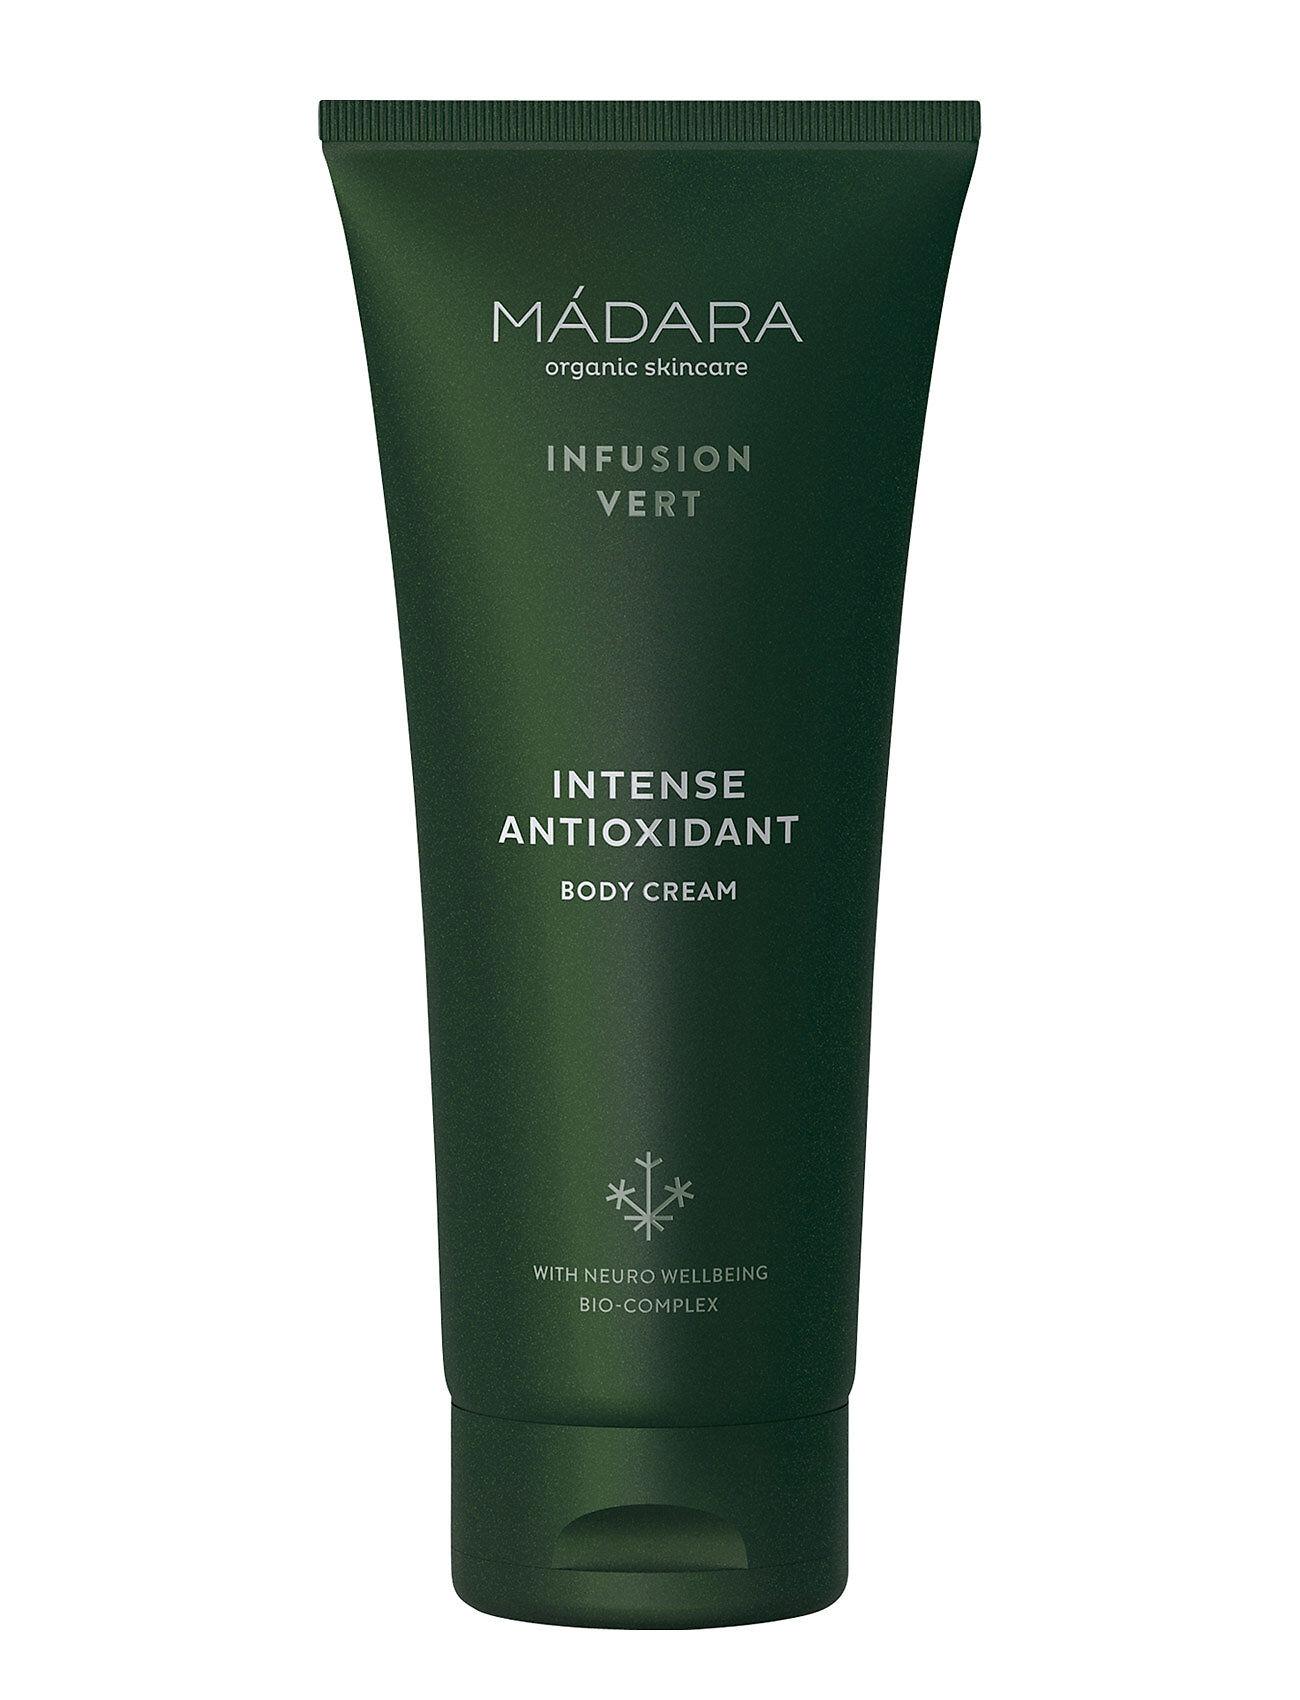 MÁDARA Infusion Vert Intense Antioxidant Body Cream, 200 Ml